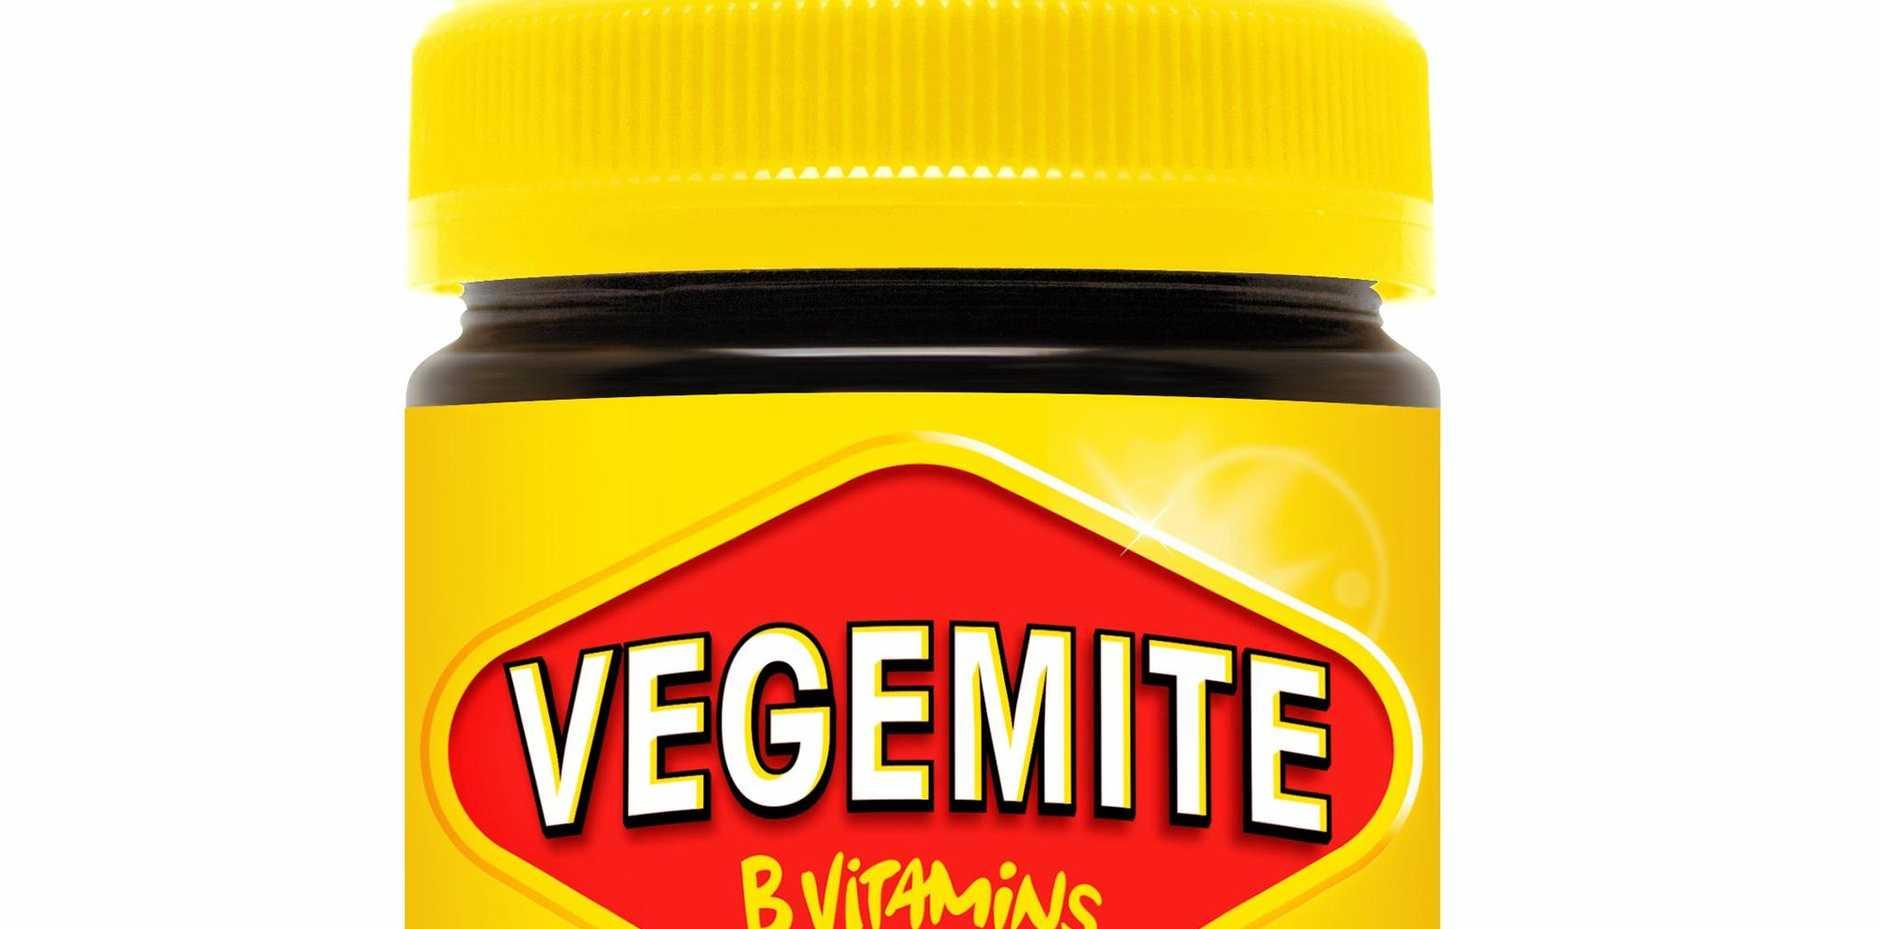 Vegemite is Australian owned once again, just like Keith Pitt.